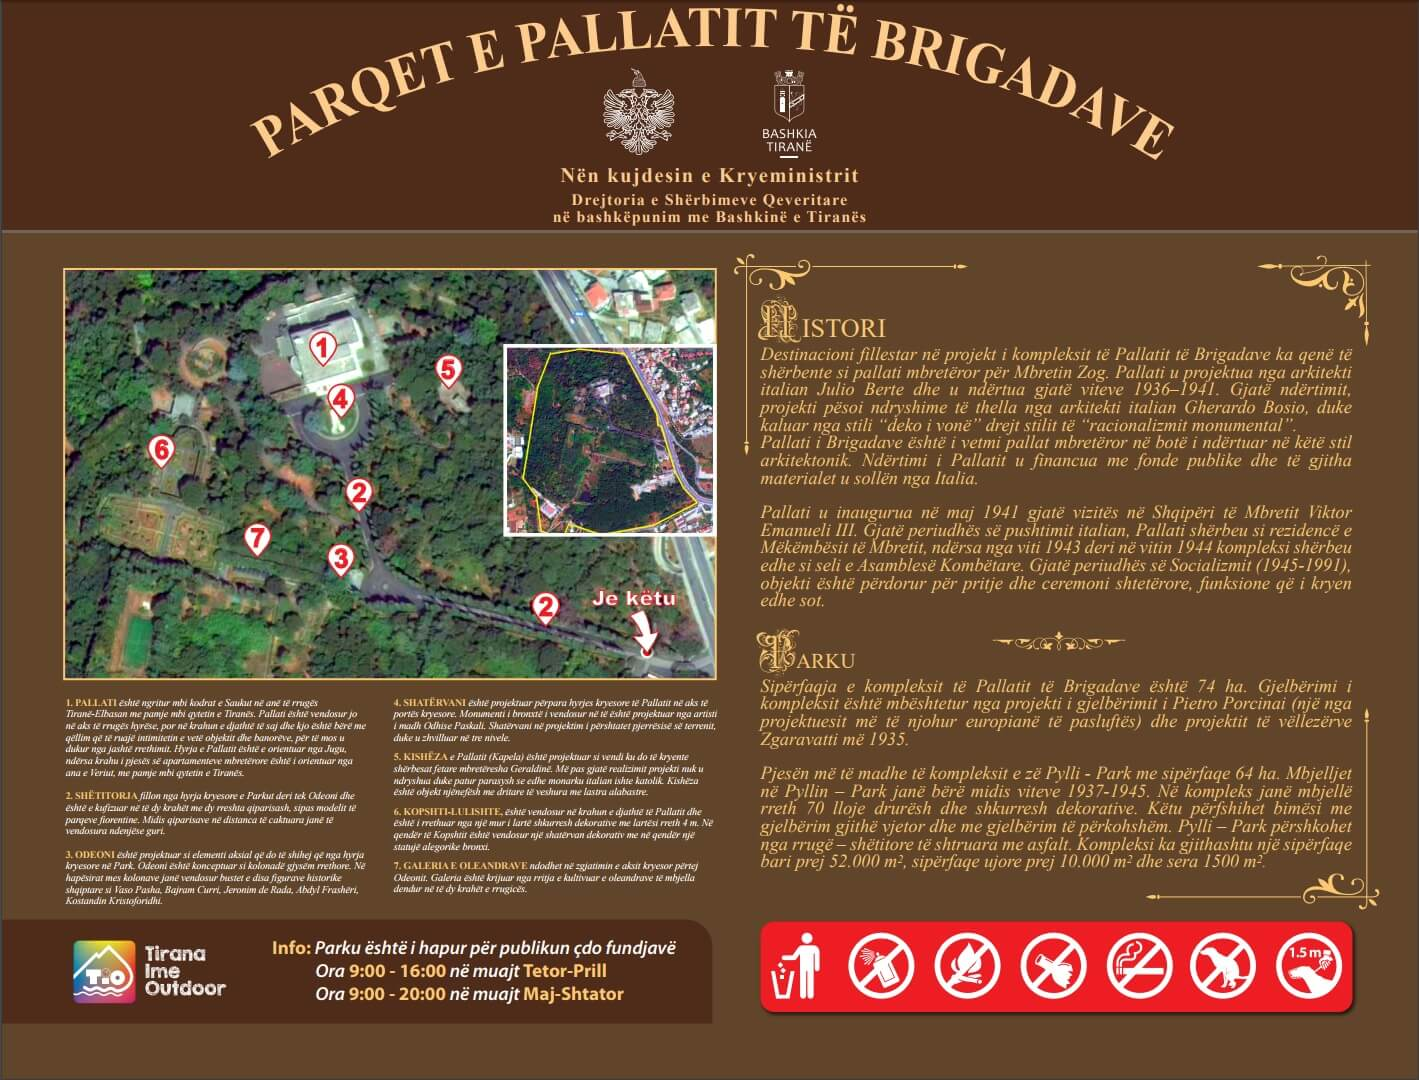 Parqet e Pallatit te brigadave